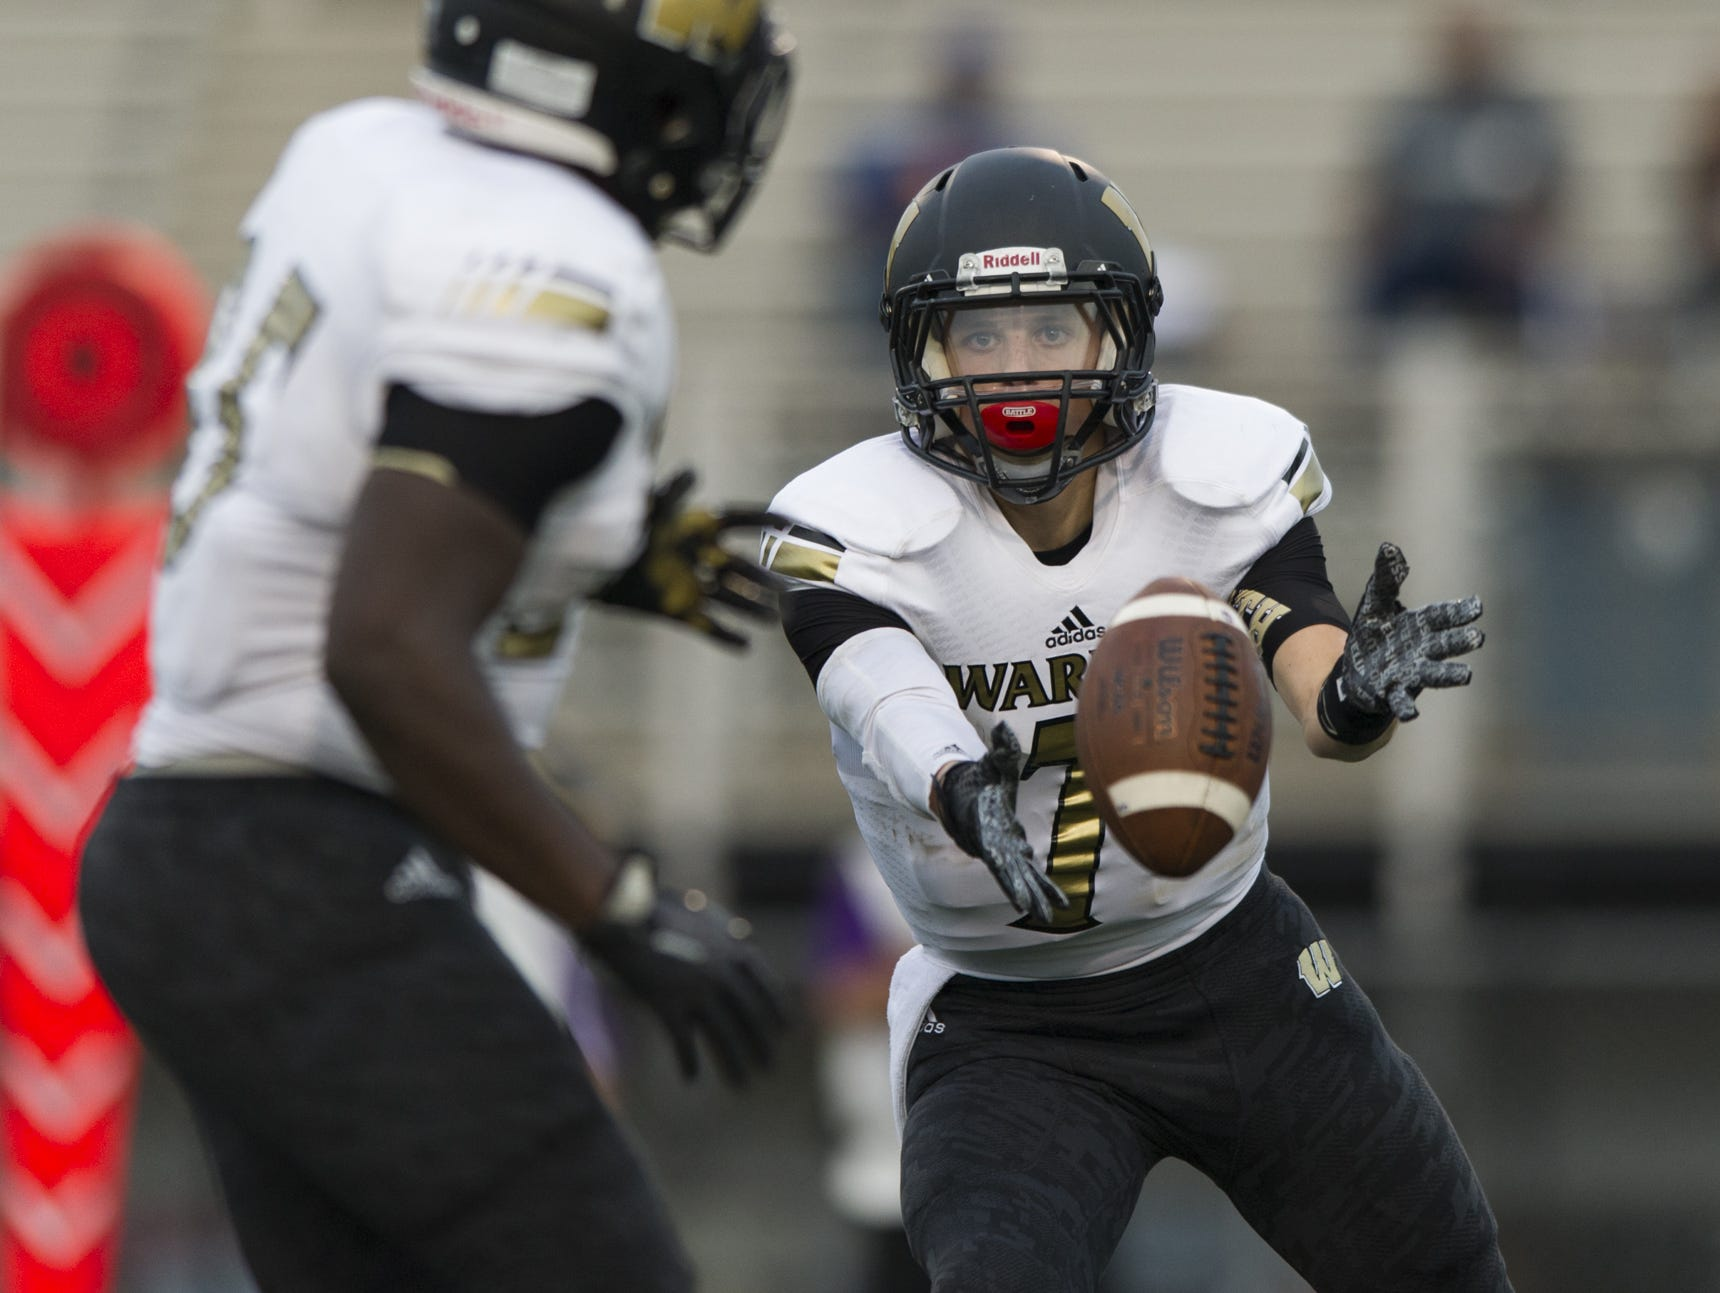 Warren Central High School junior quarterback Zach Summeier (7) pitches the ball to teammate senior Terry Hart (35) in the backfield during first-half action of a IHSAA varsity football game at Ben Davis High School, Friday, September 18, 2015.